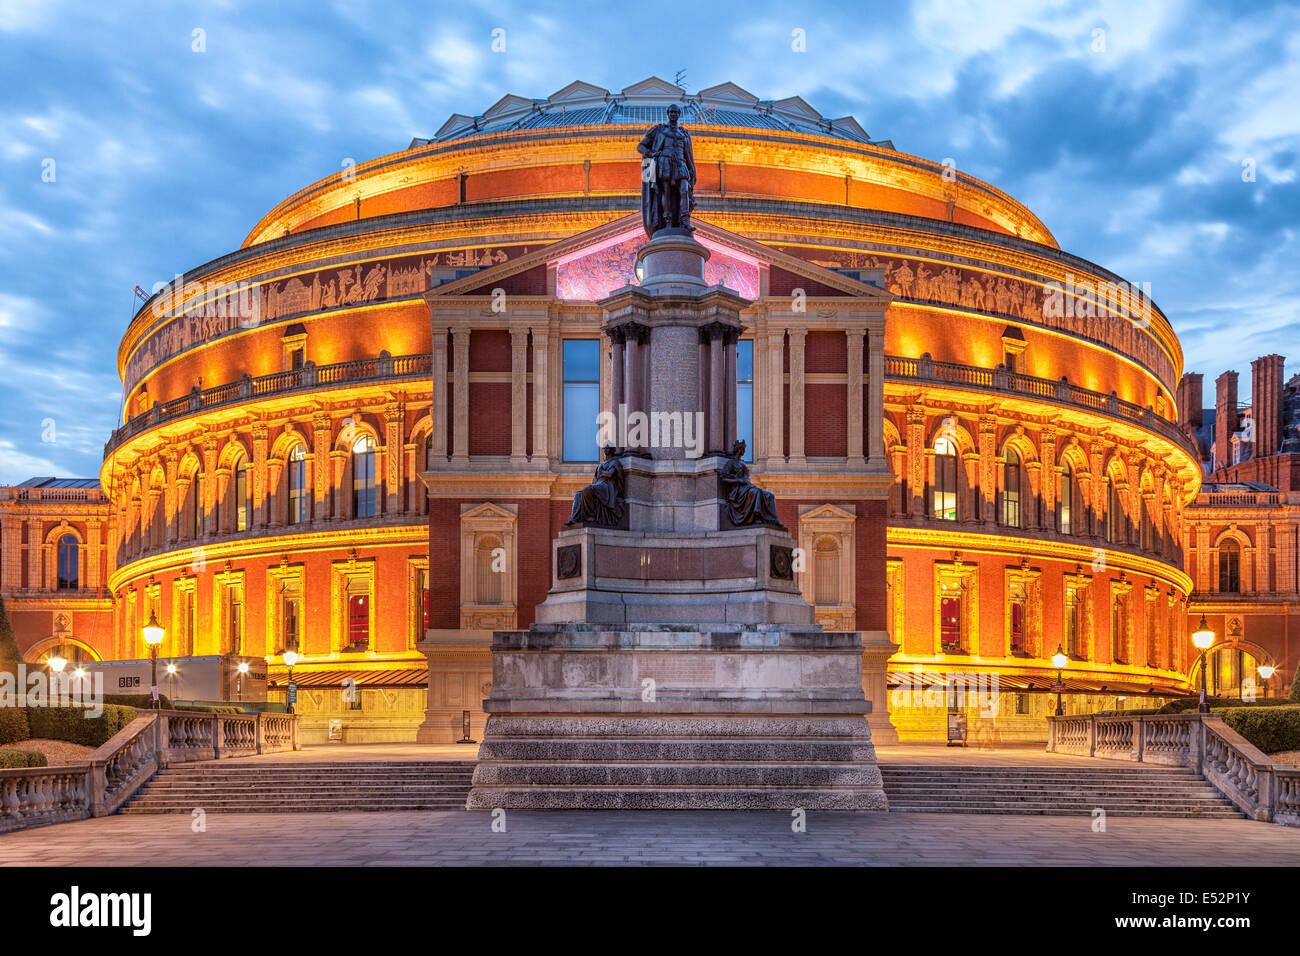 Royal Albert Hall,Kensington Gore,London,England - Stock Image